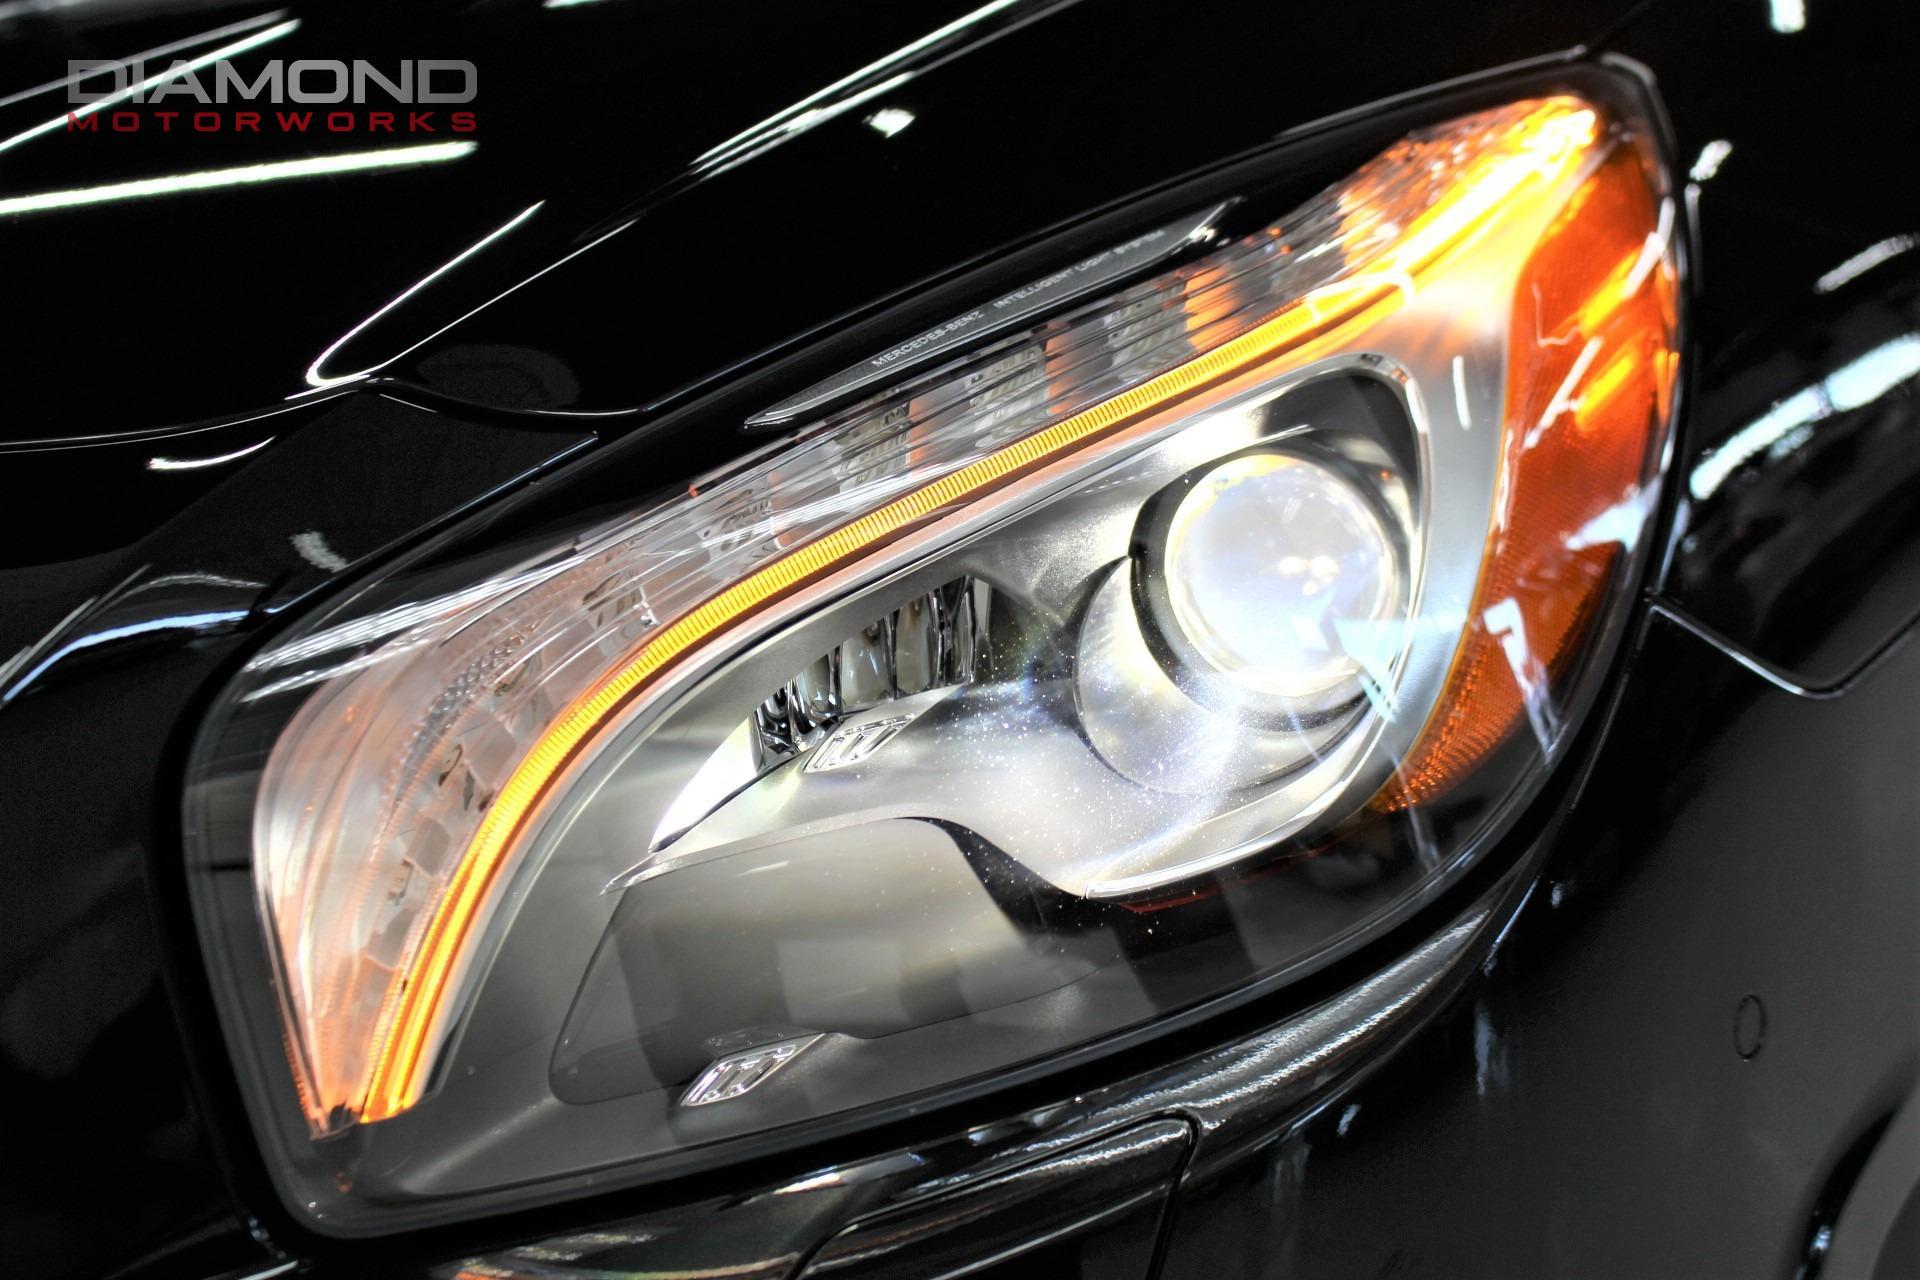 Used-2014-Mercedes-Benz-SL-Class-SL63-AMG